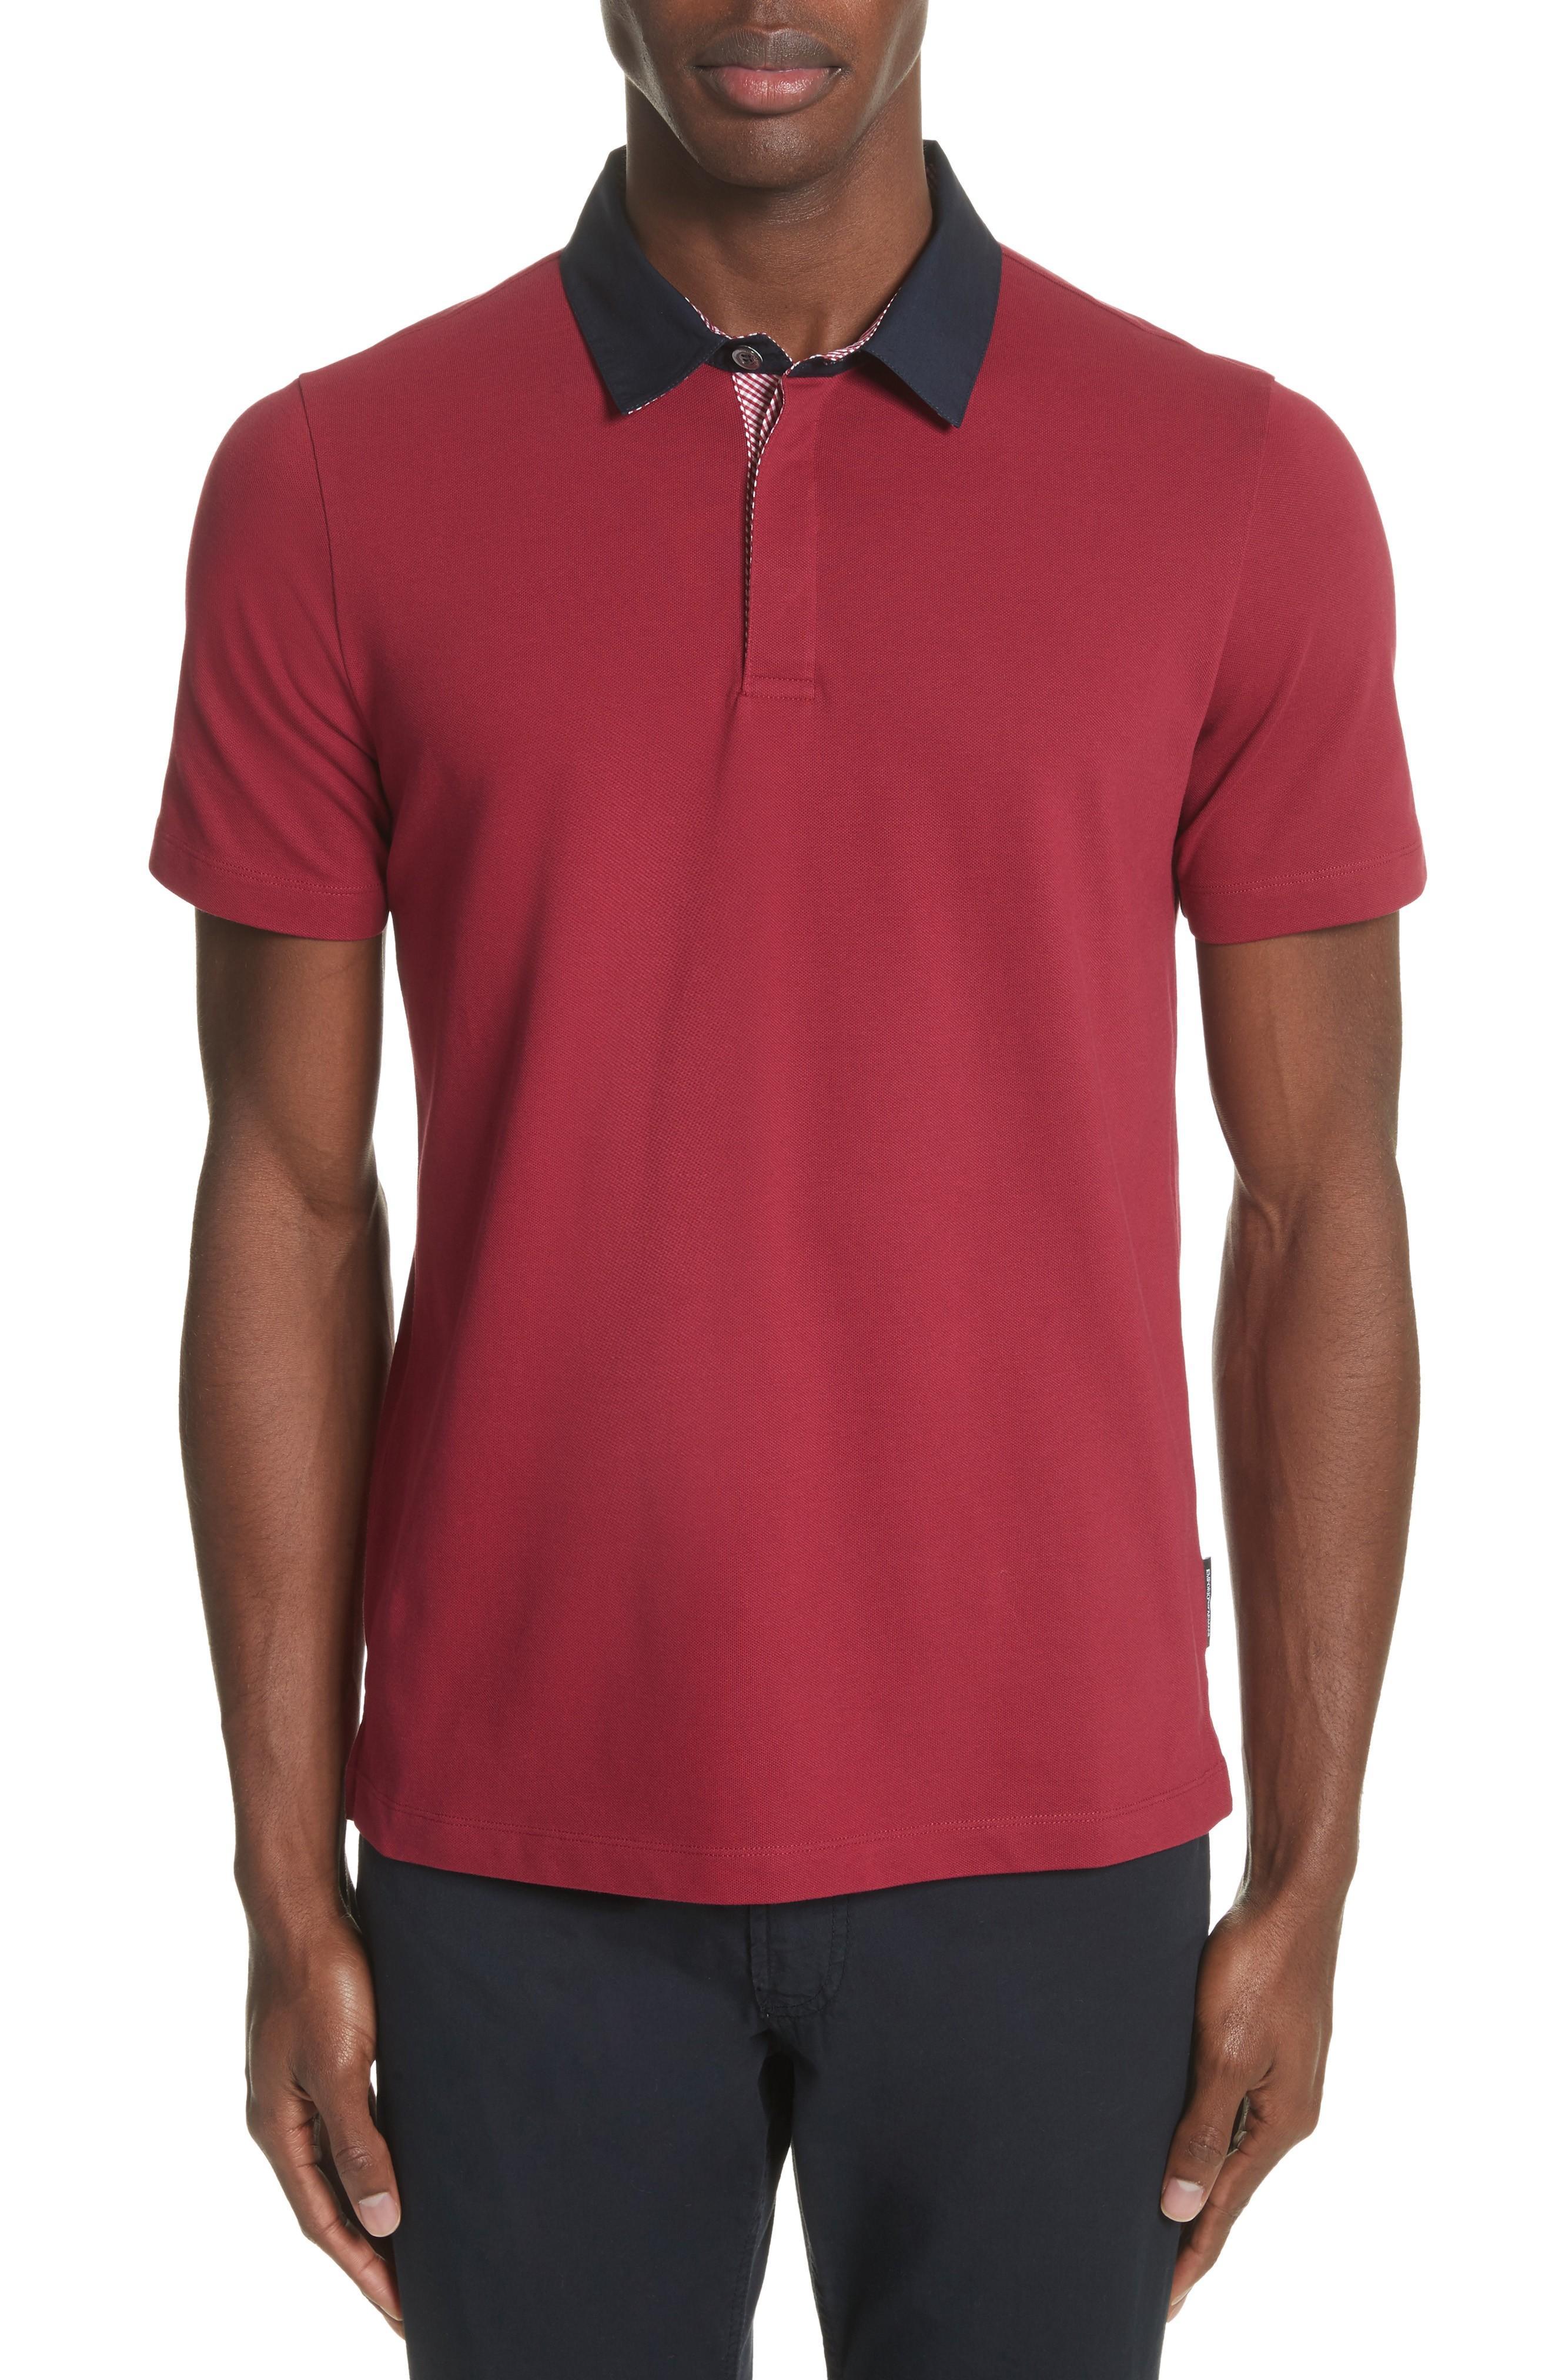 Emporio Armani Slim Fit Pique Polo Shirt In Borgogna